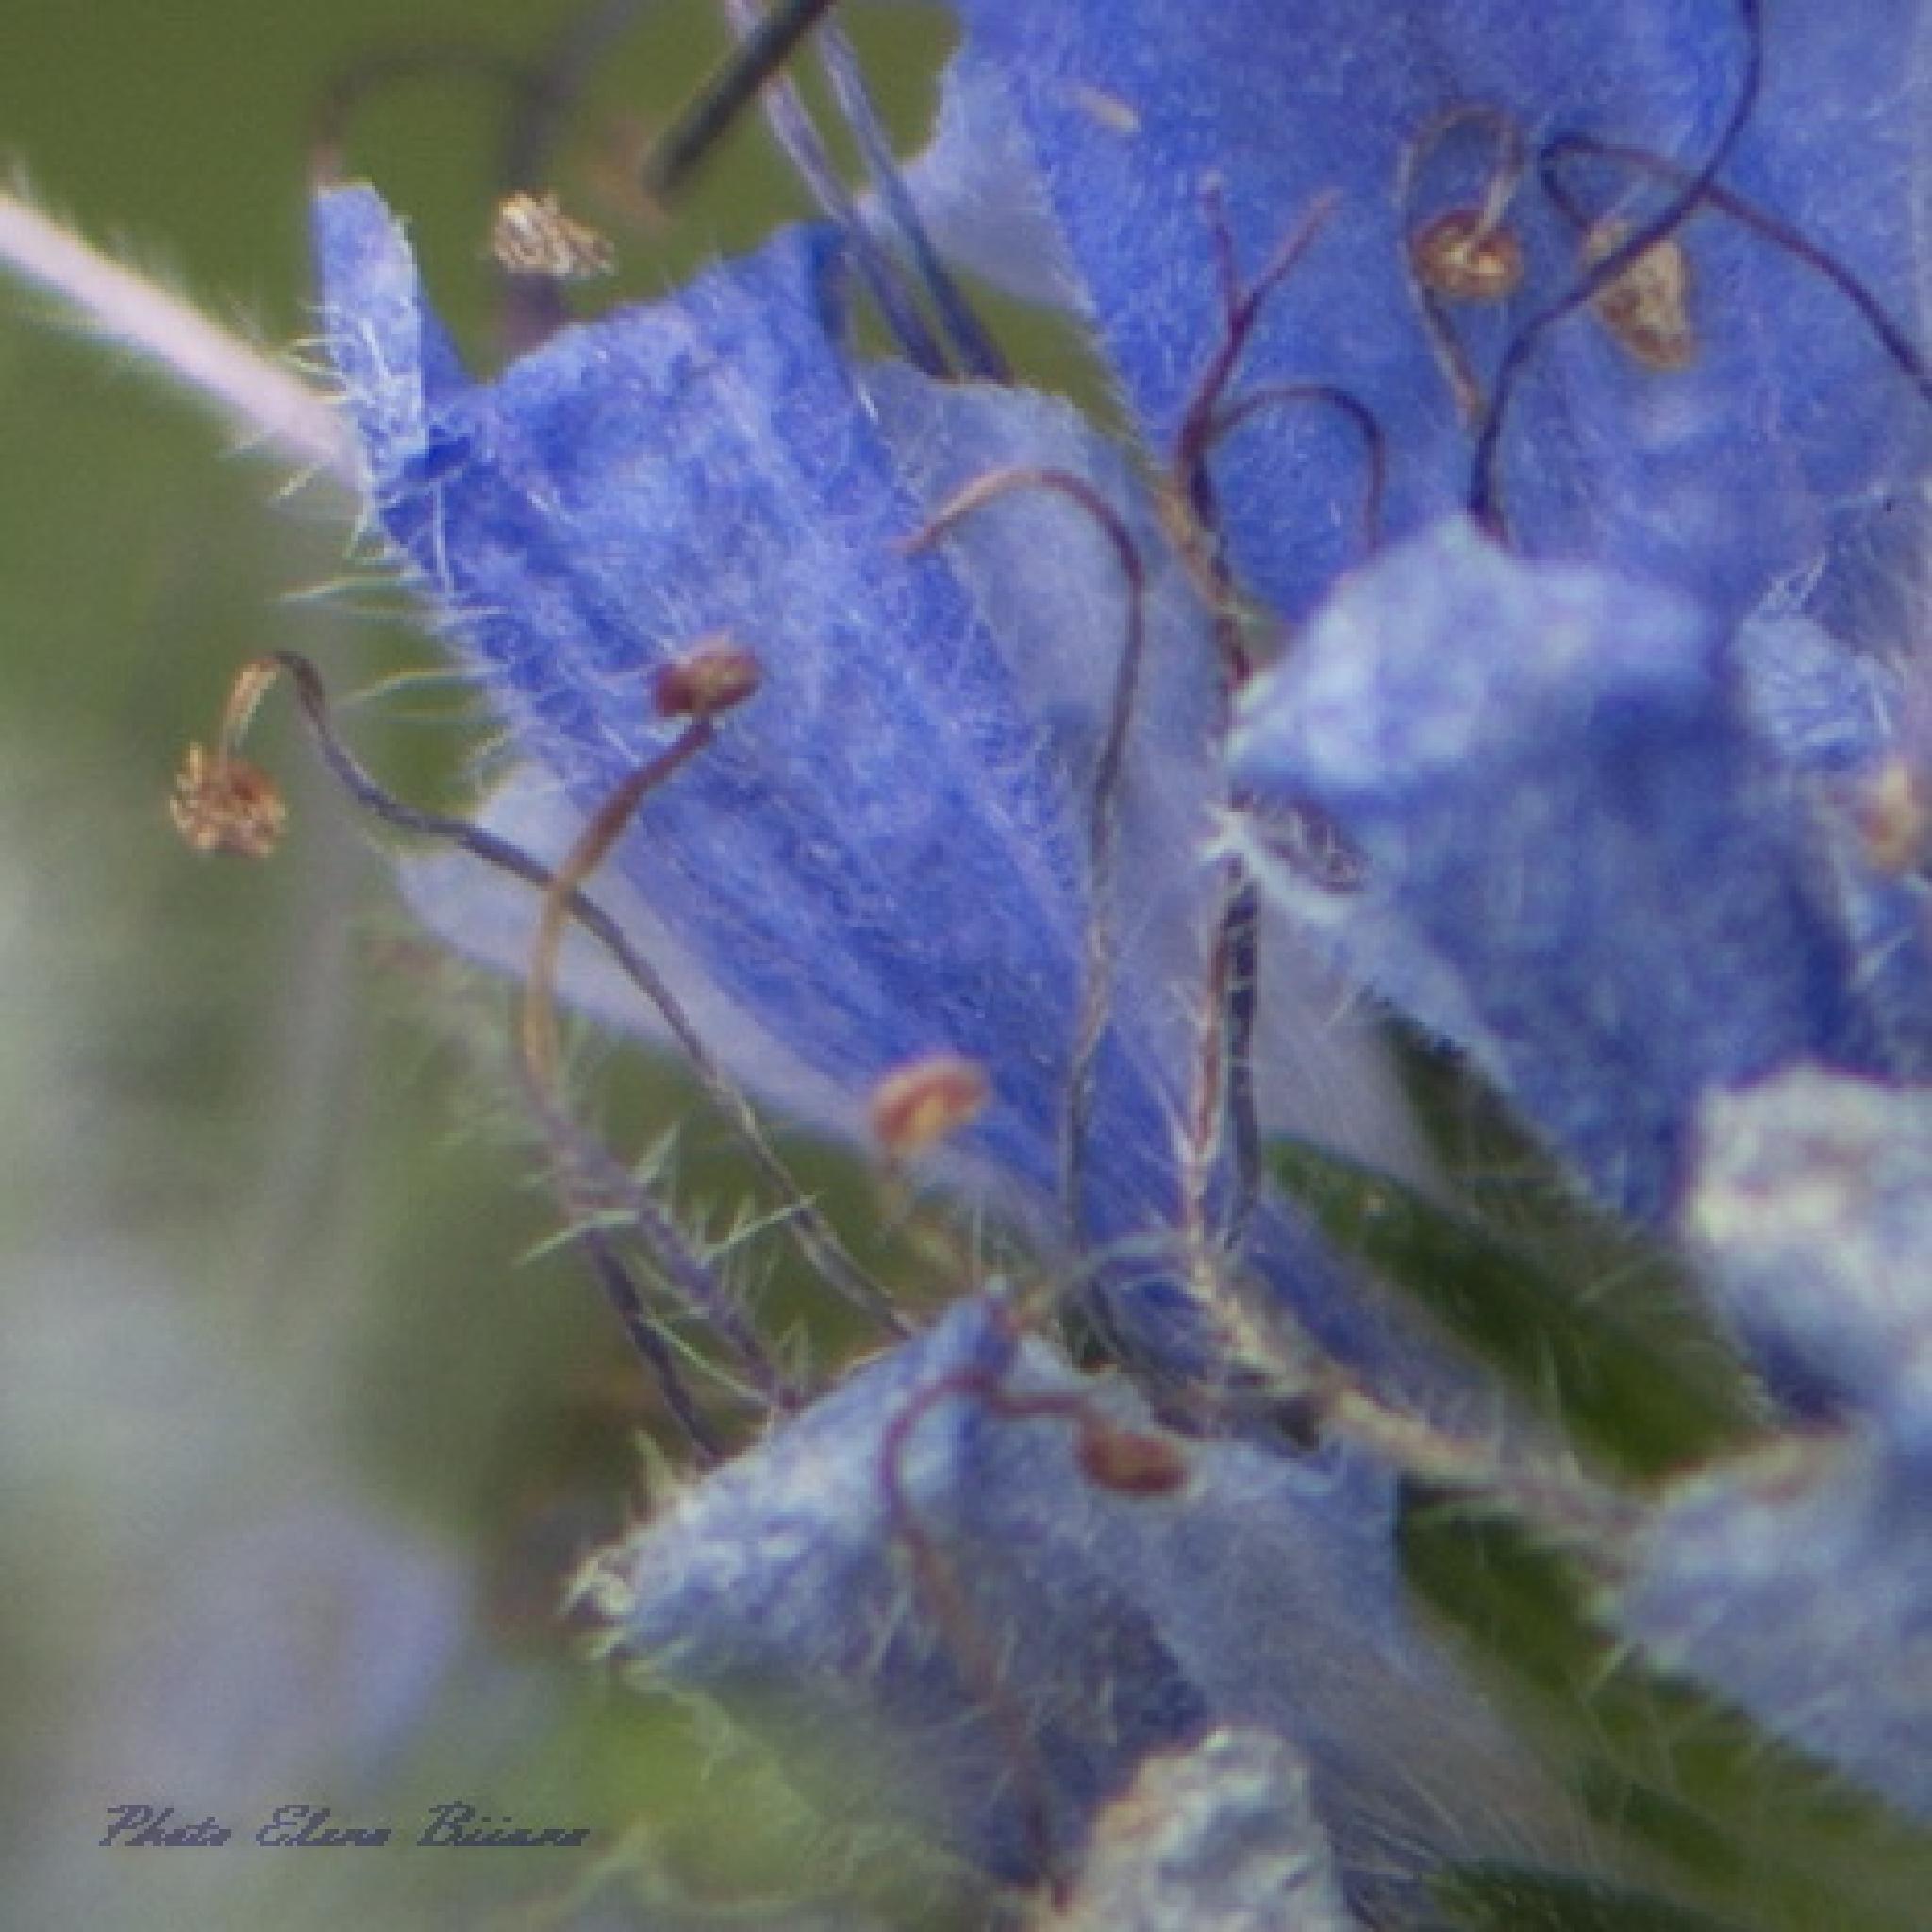 Colors of nature #2 by elena.biianu